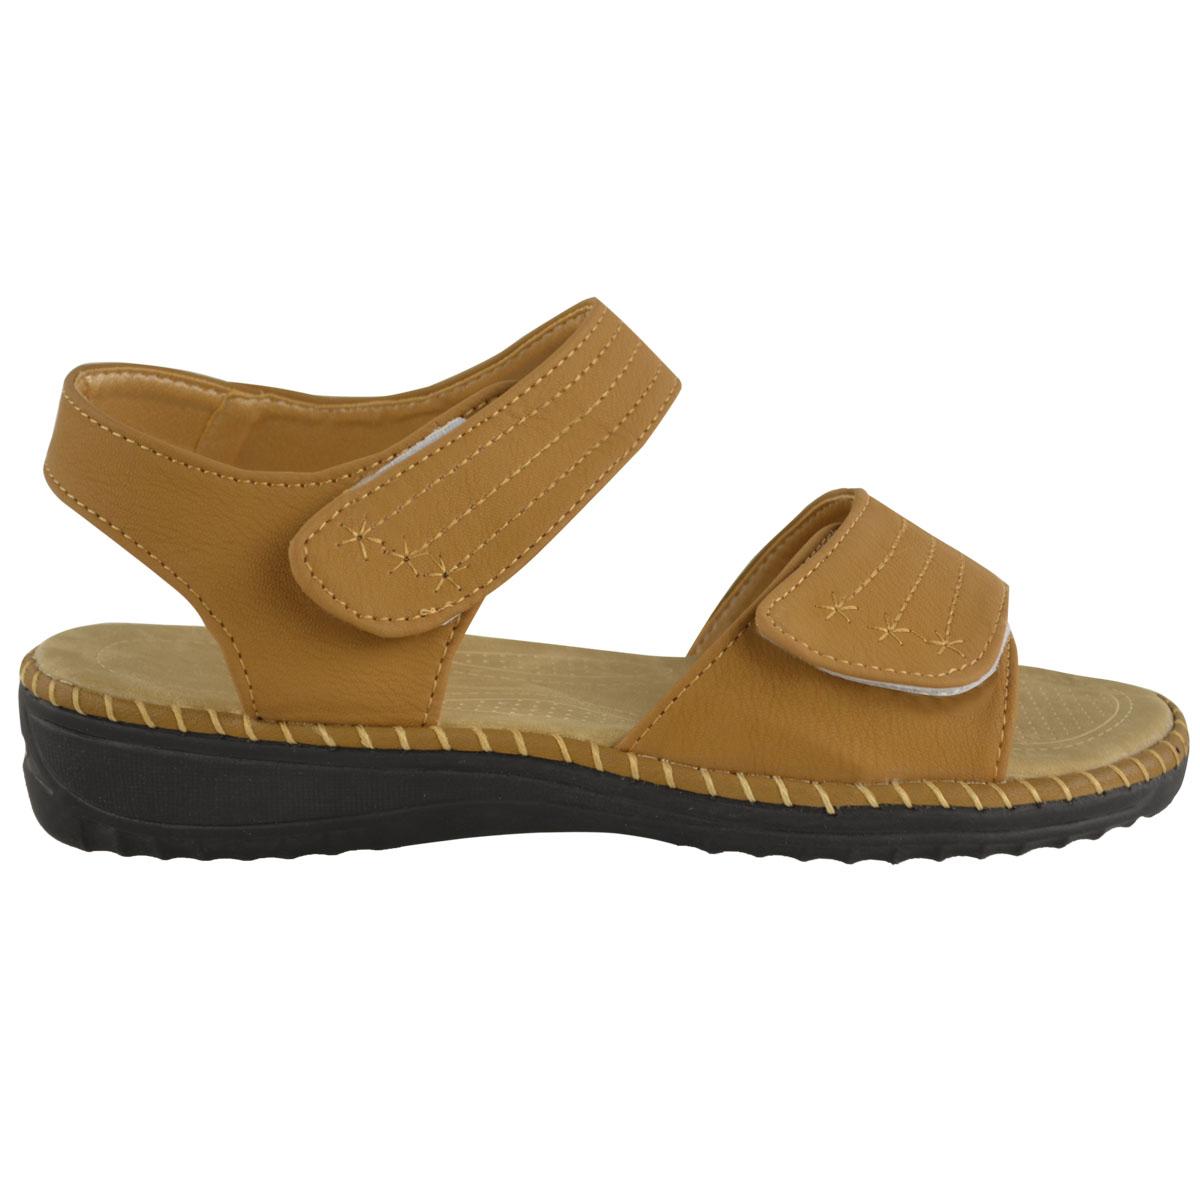 Walking Sandals Womens Amazon Fashion